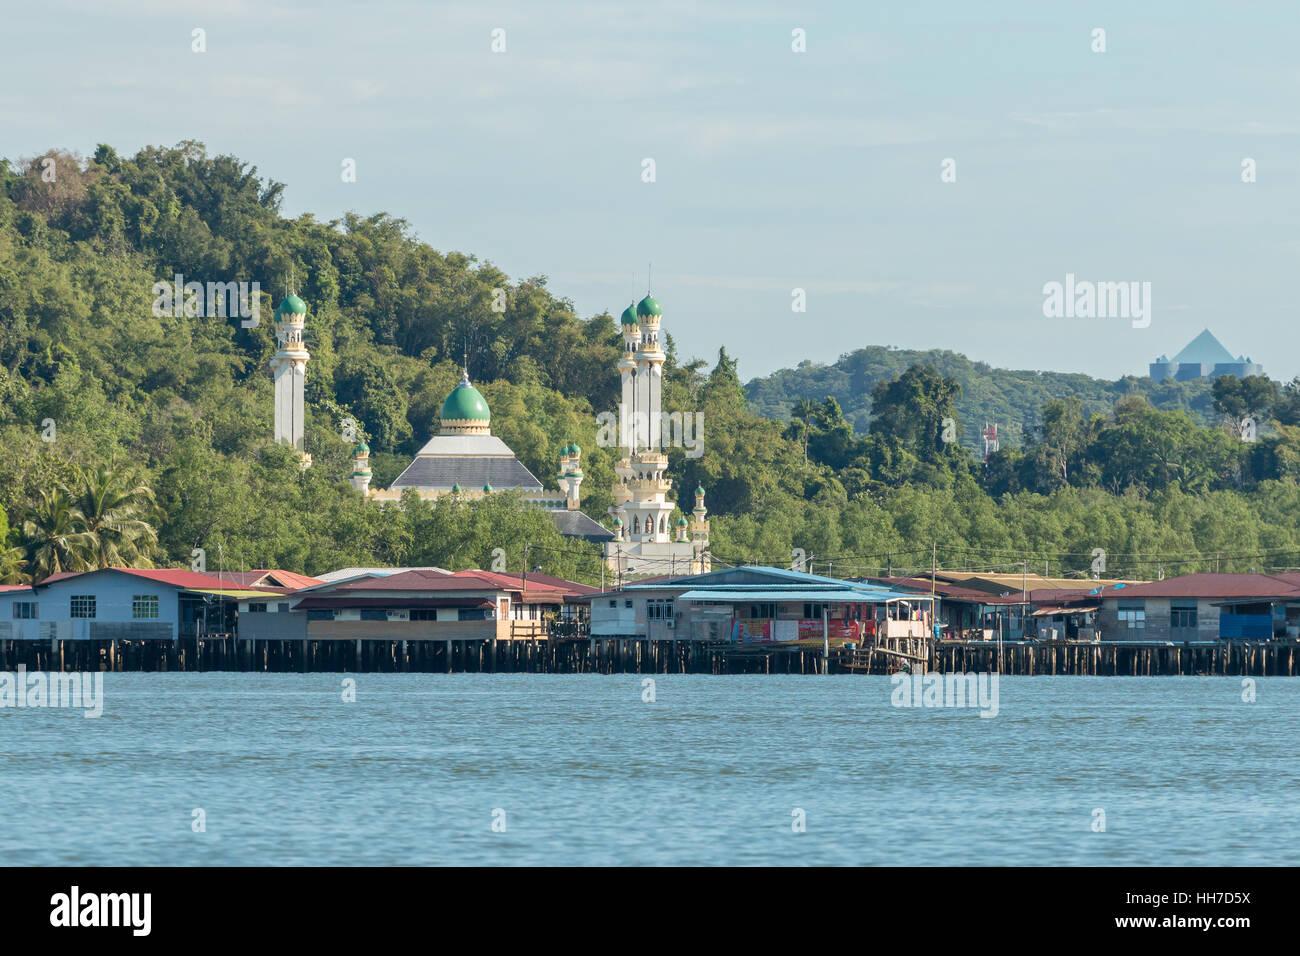 Villaggio galleggiante, Bandar Seri Begawan Immagini Stock